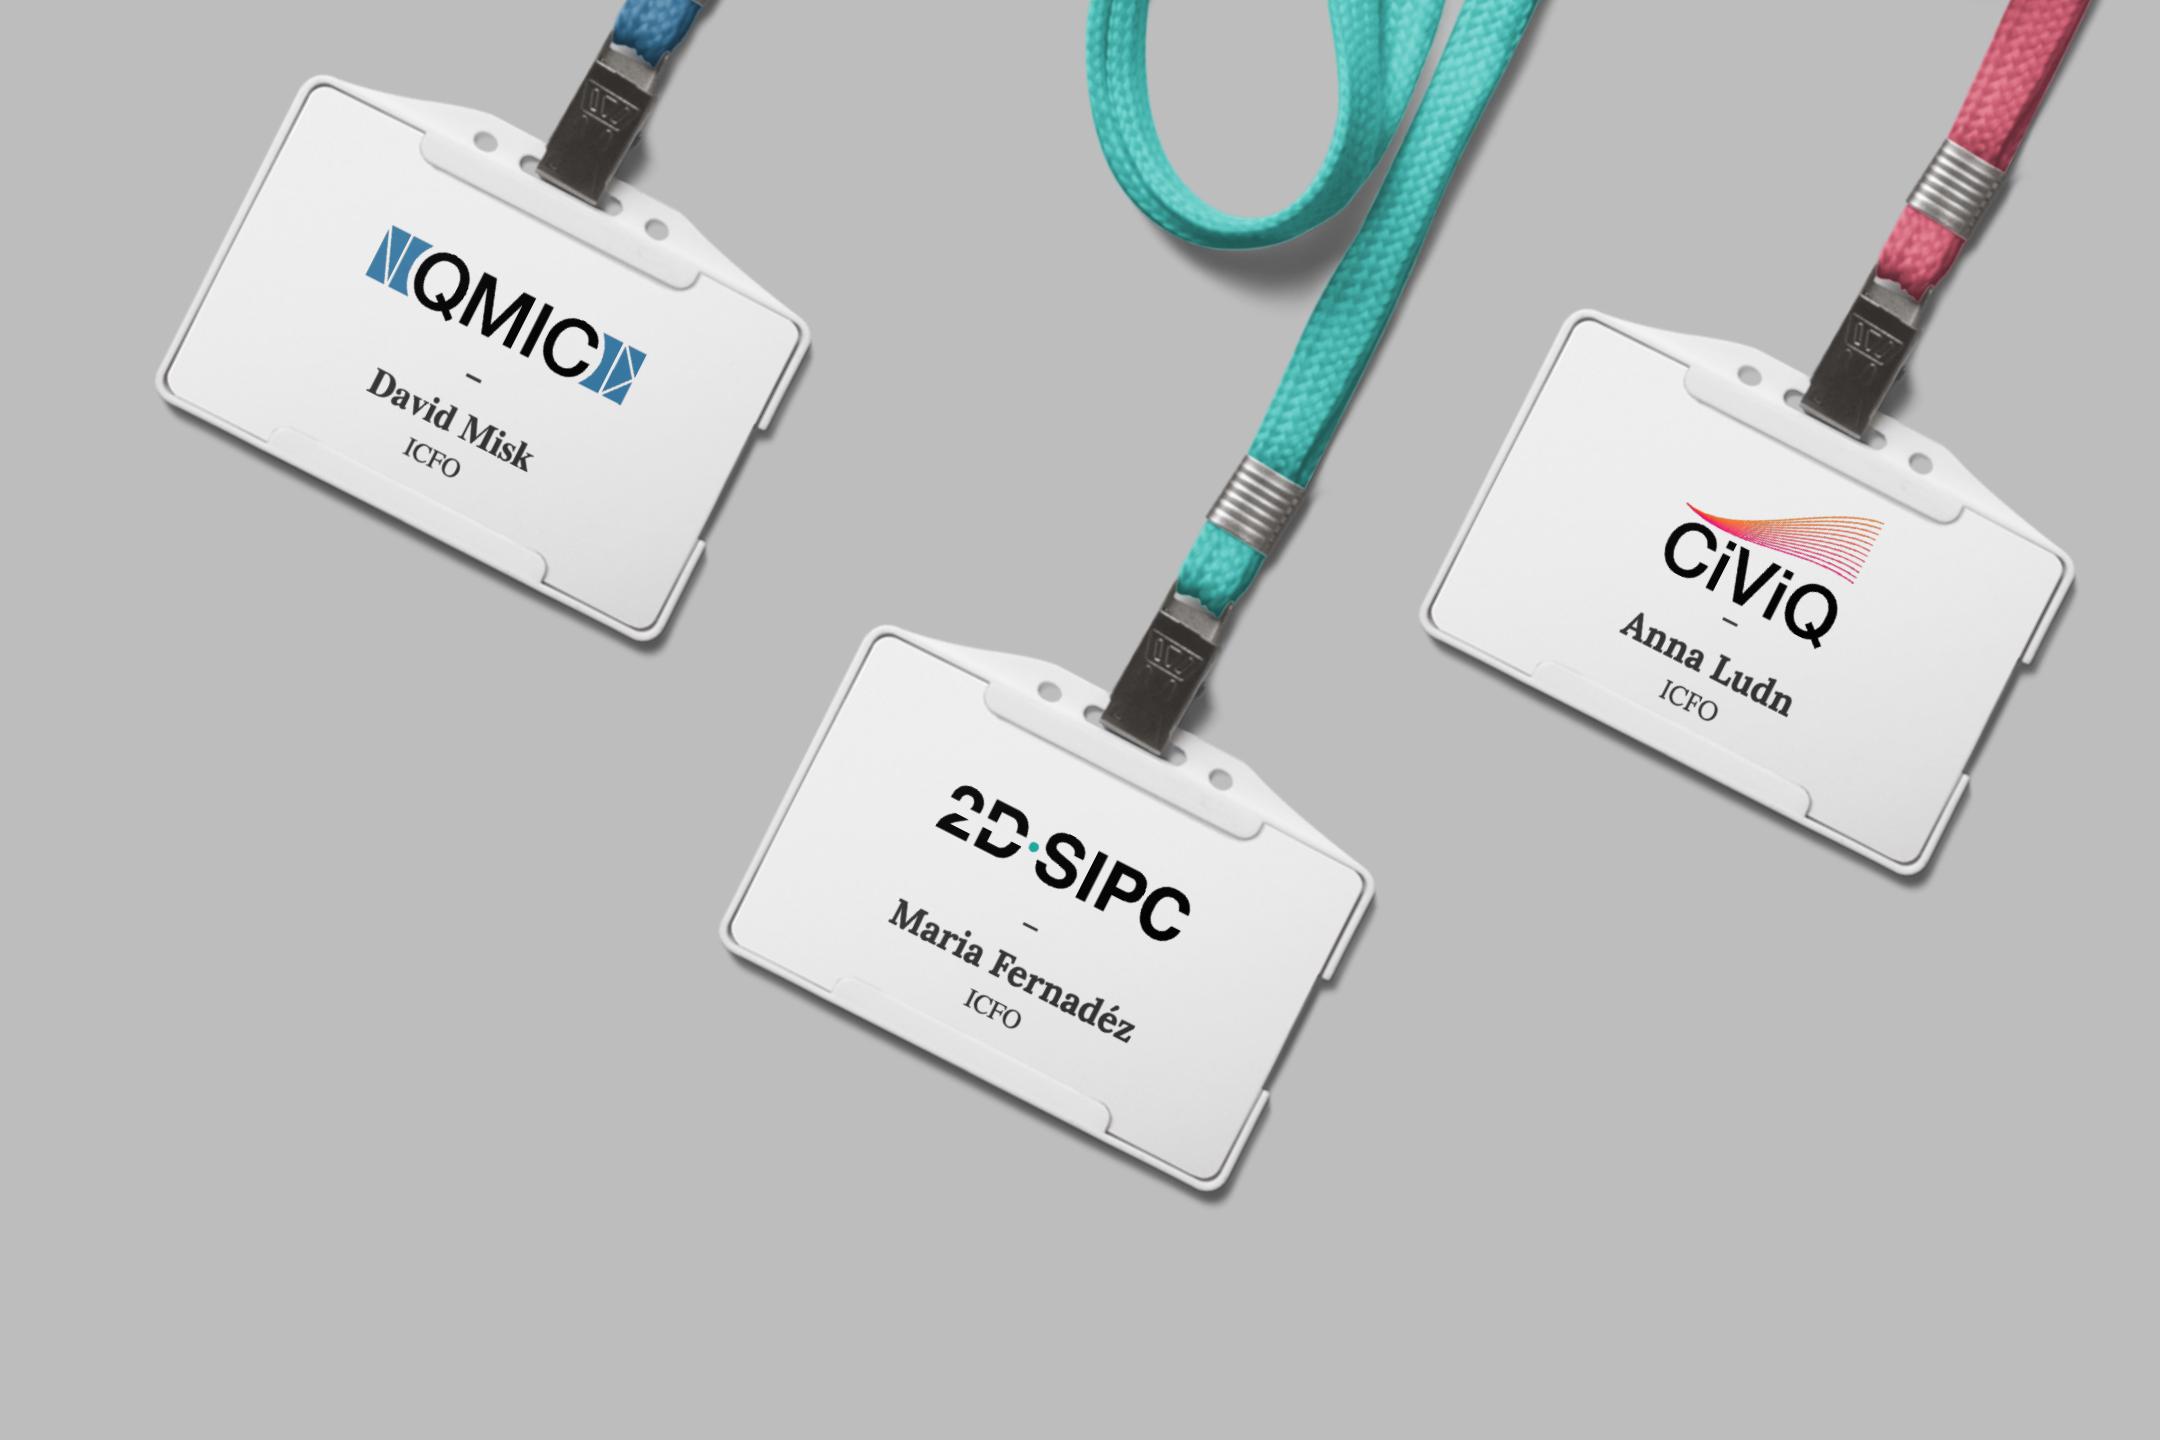 Bitflow-studio-logo-scientific-project-conference-badge-2